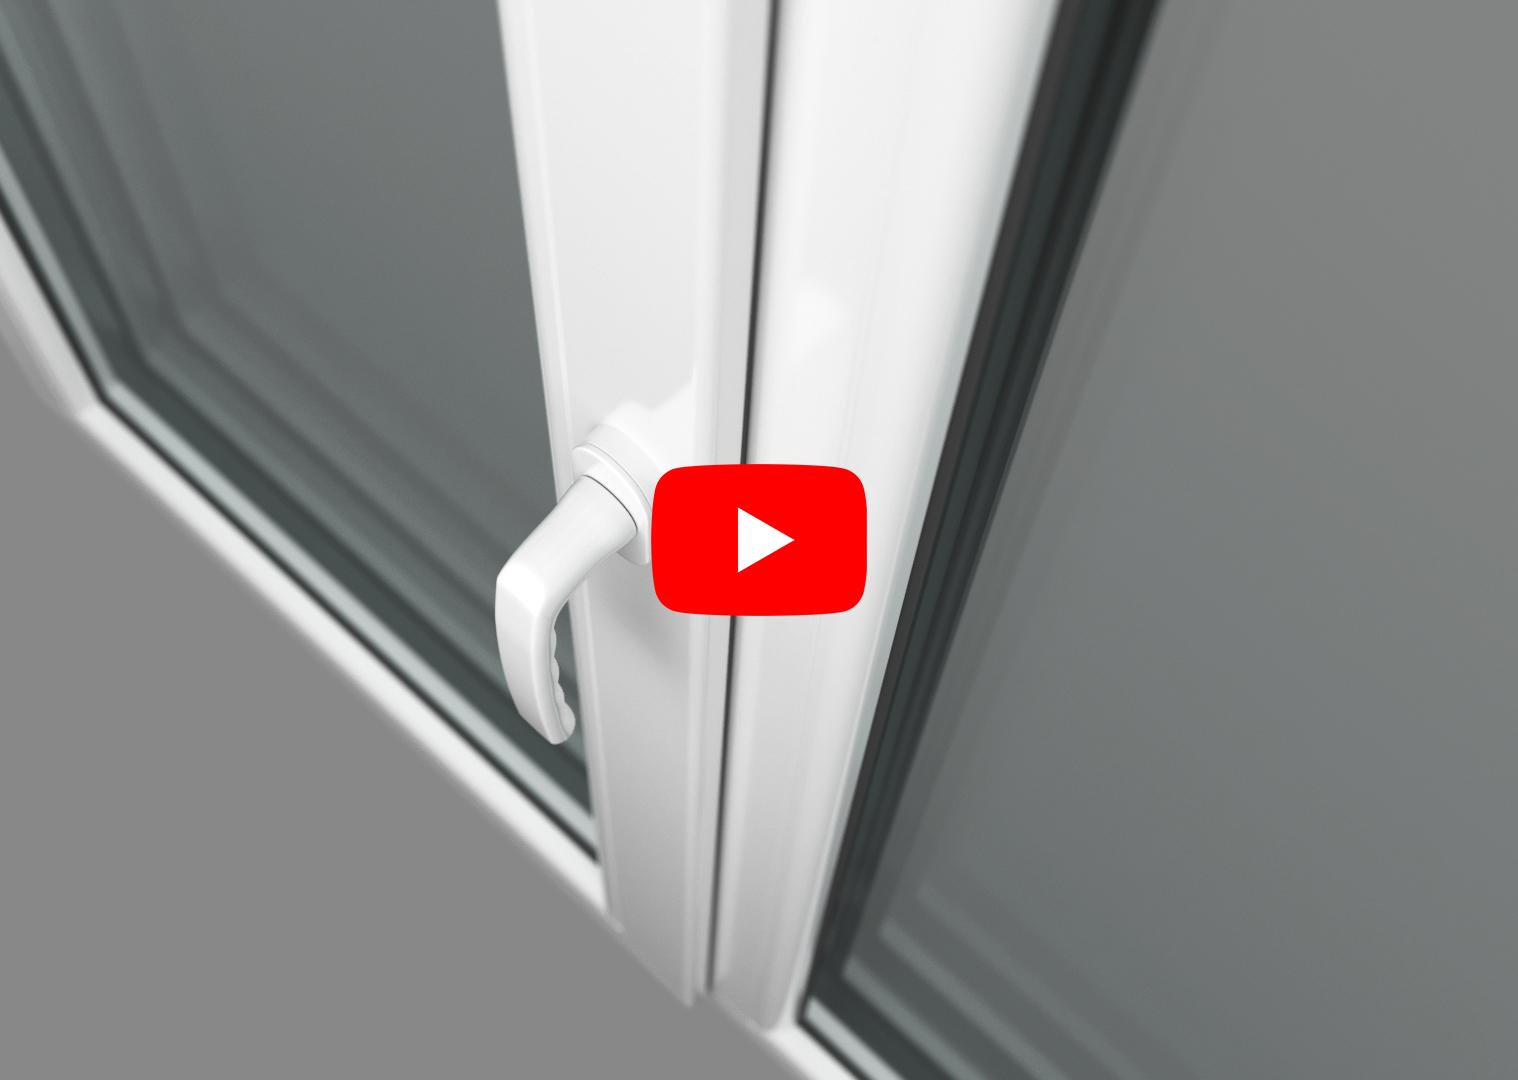 Window 3D Animation 1920x1080 / 35 sec / WDS 8S